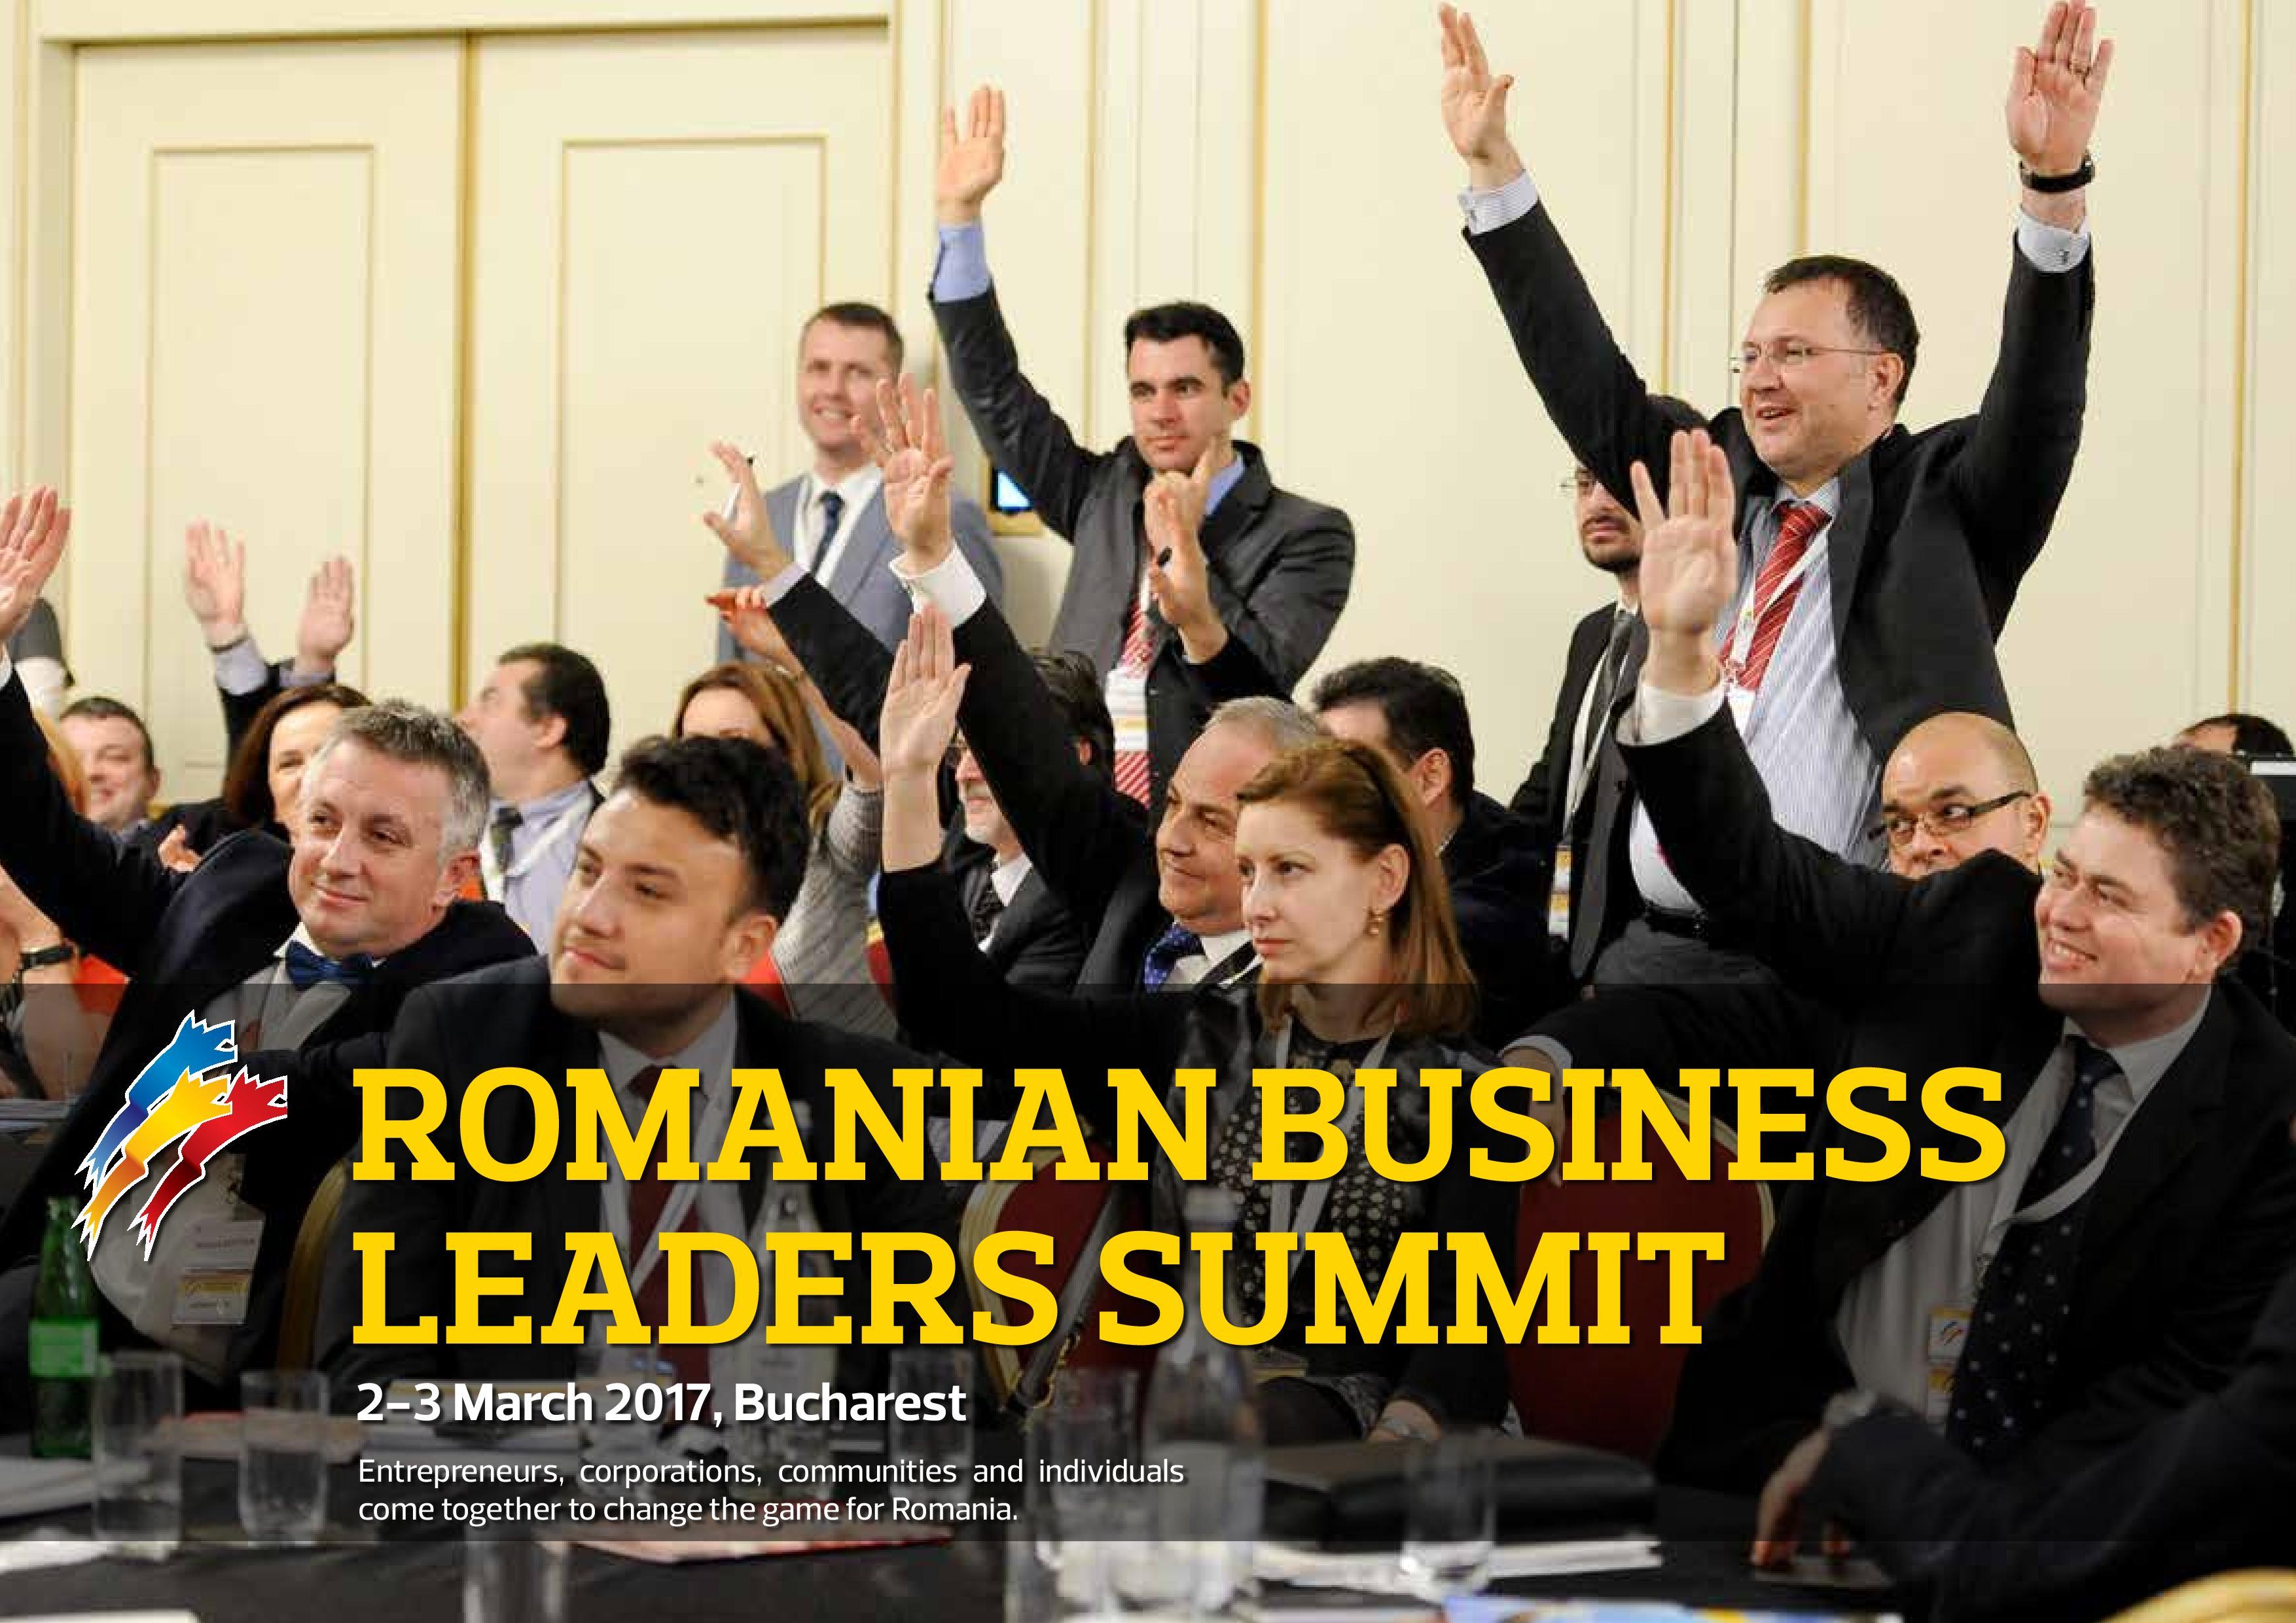 Romanian Business Leaders Summit 2017